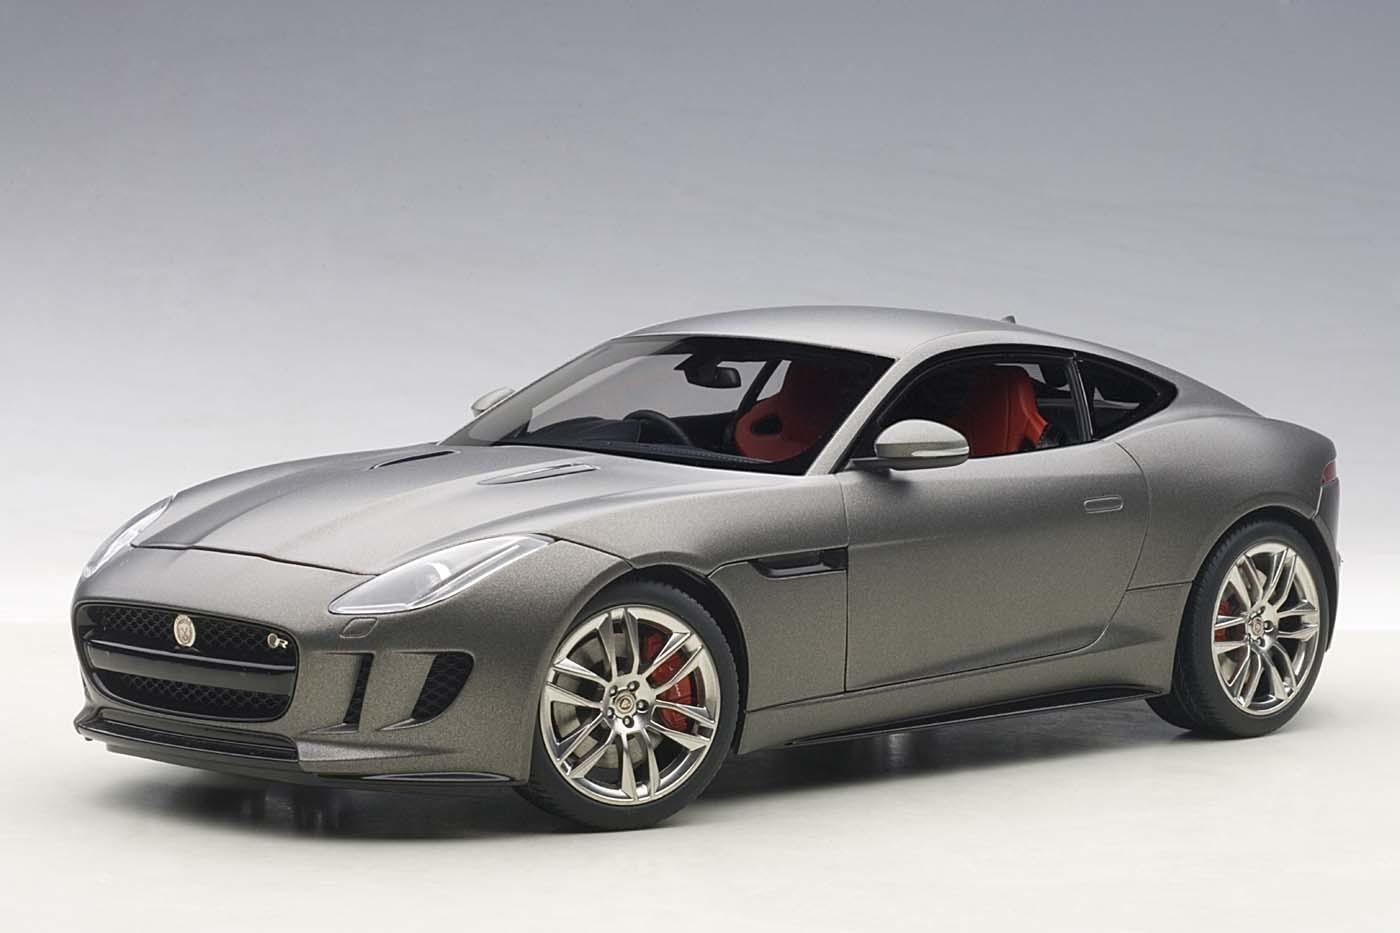 F Type Coupe >> Highly detailed AUTOart diecast model car Jaguar F-Type 2015 R Coupe Matt Grey Die-Cast AUTOart ...